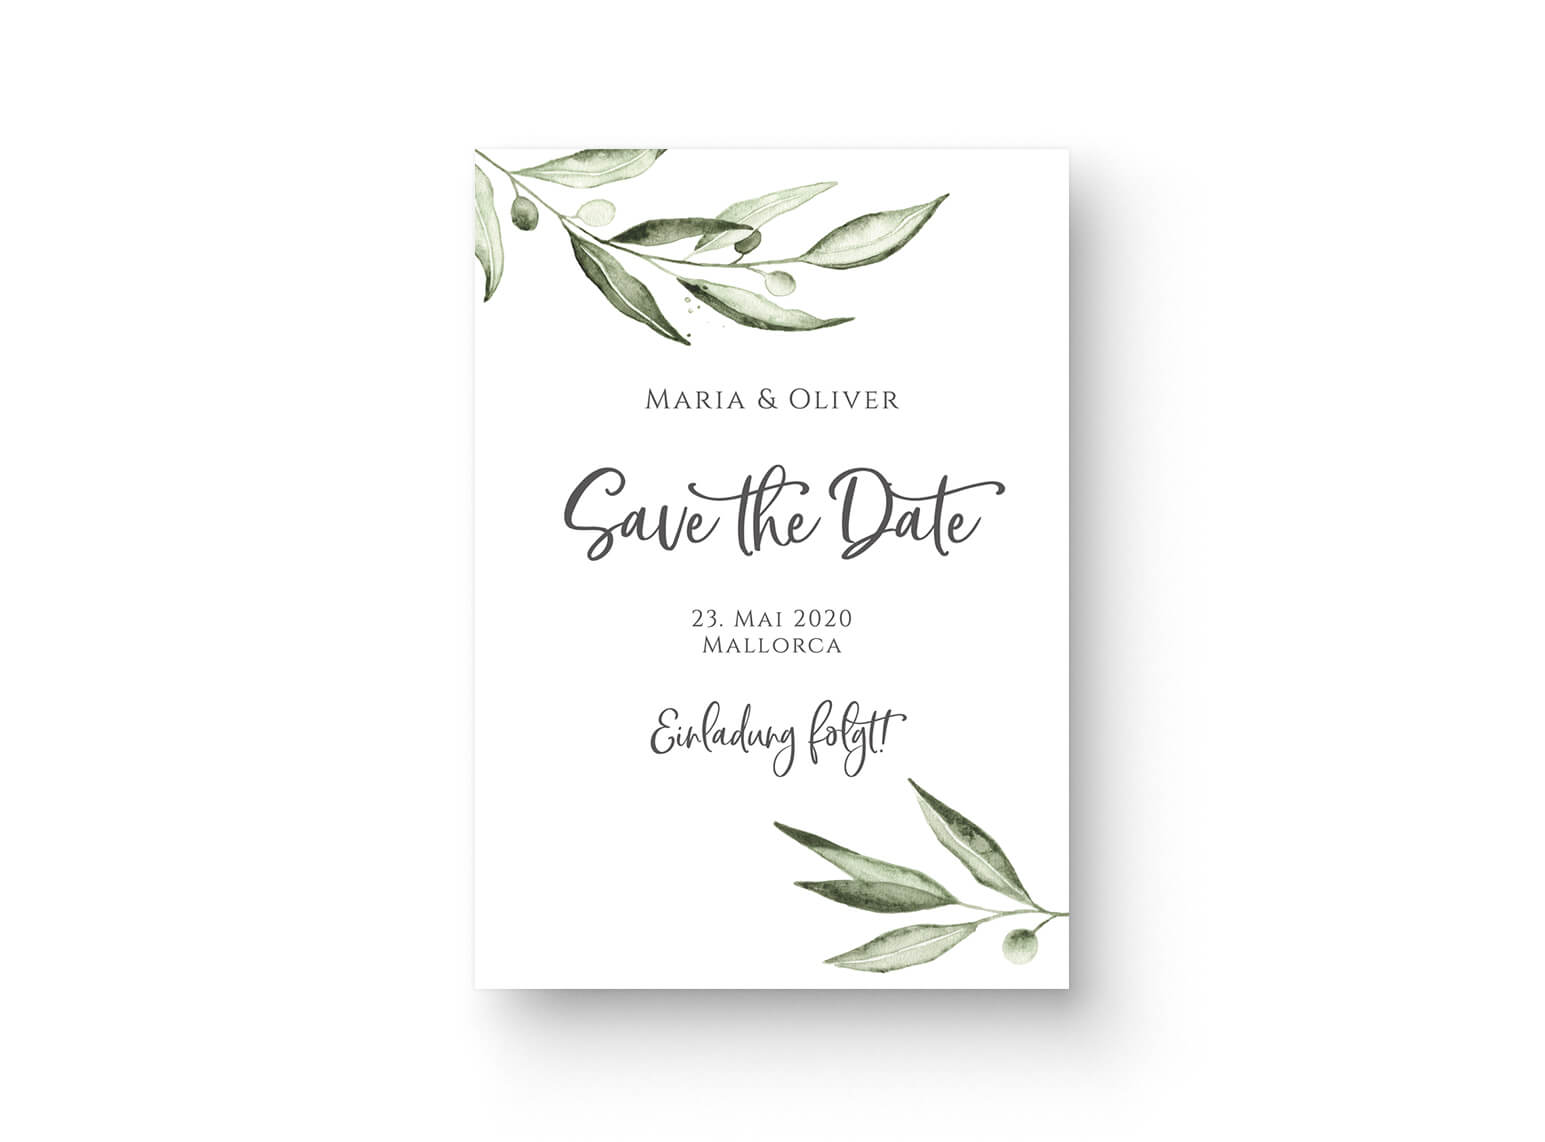 save-the-date-postkarte-olive-zweig-aquarell-gruen-grau-front_MP0008-1.0.1